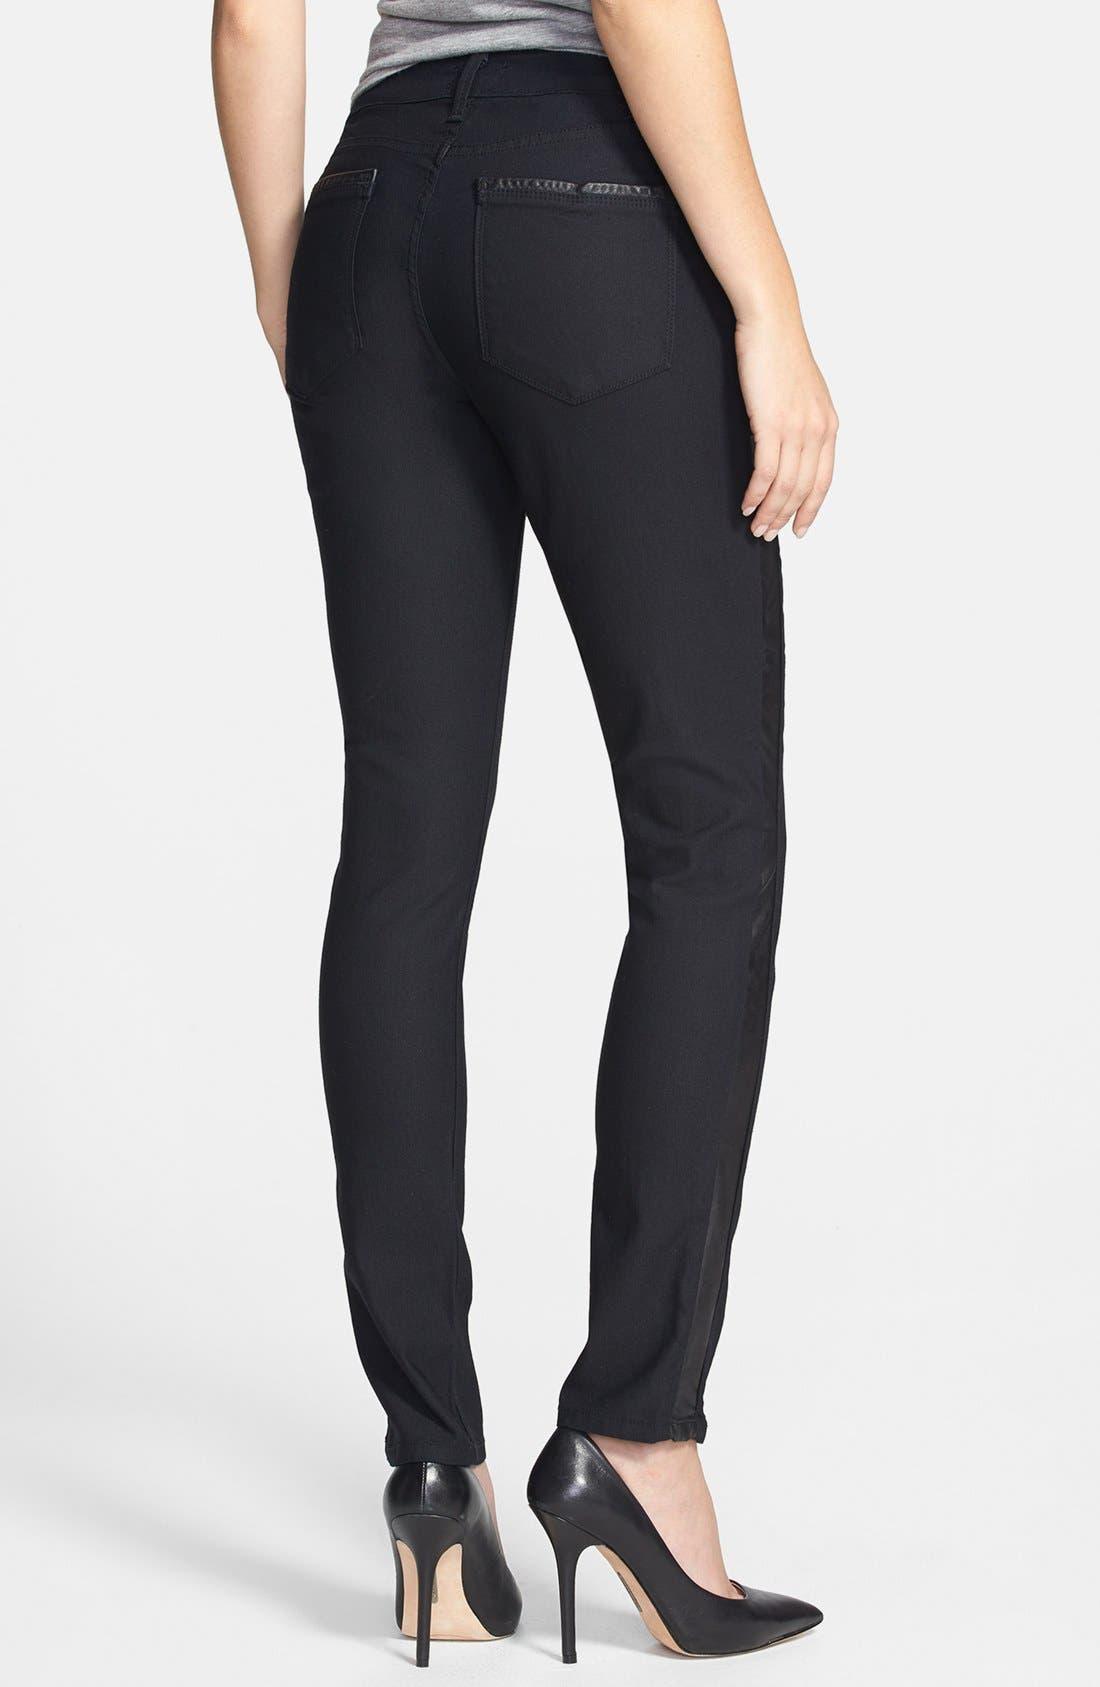 'Megan' Faux Leather Trim Stretch Skinny Jeans,                         Main,                         color, 460